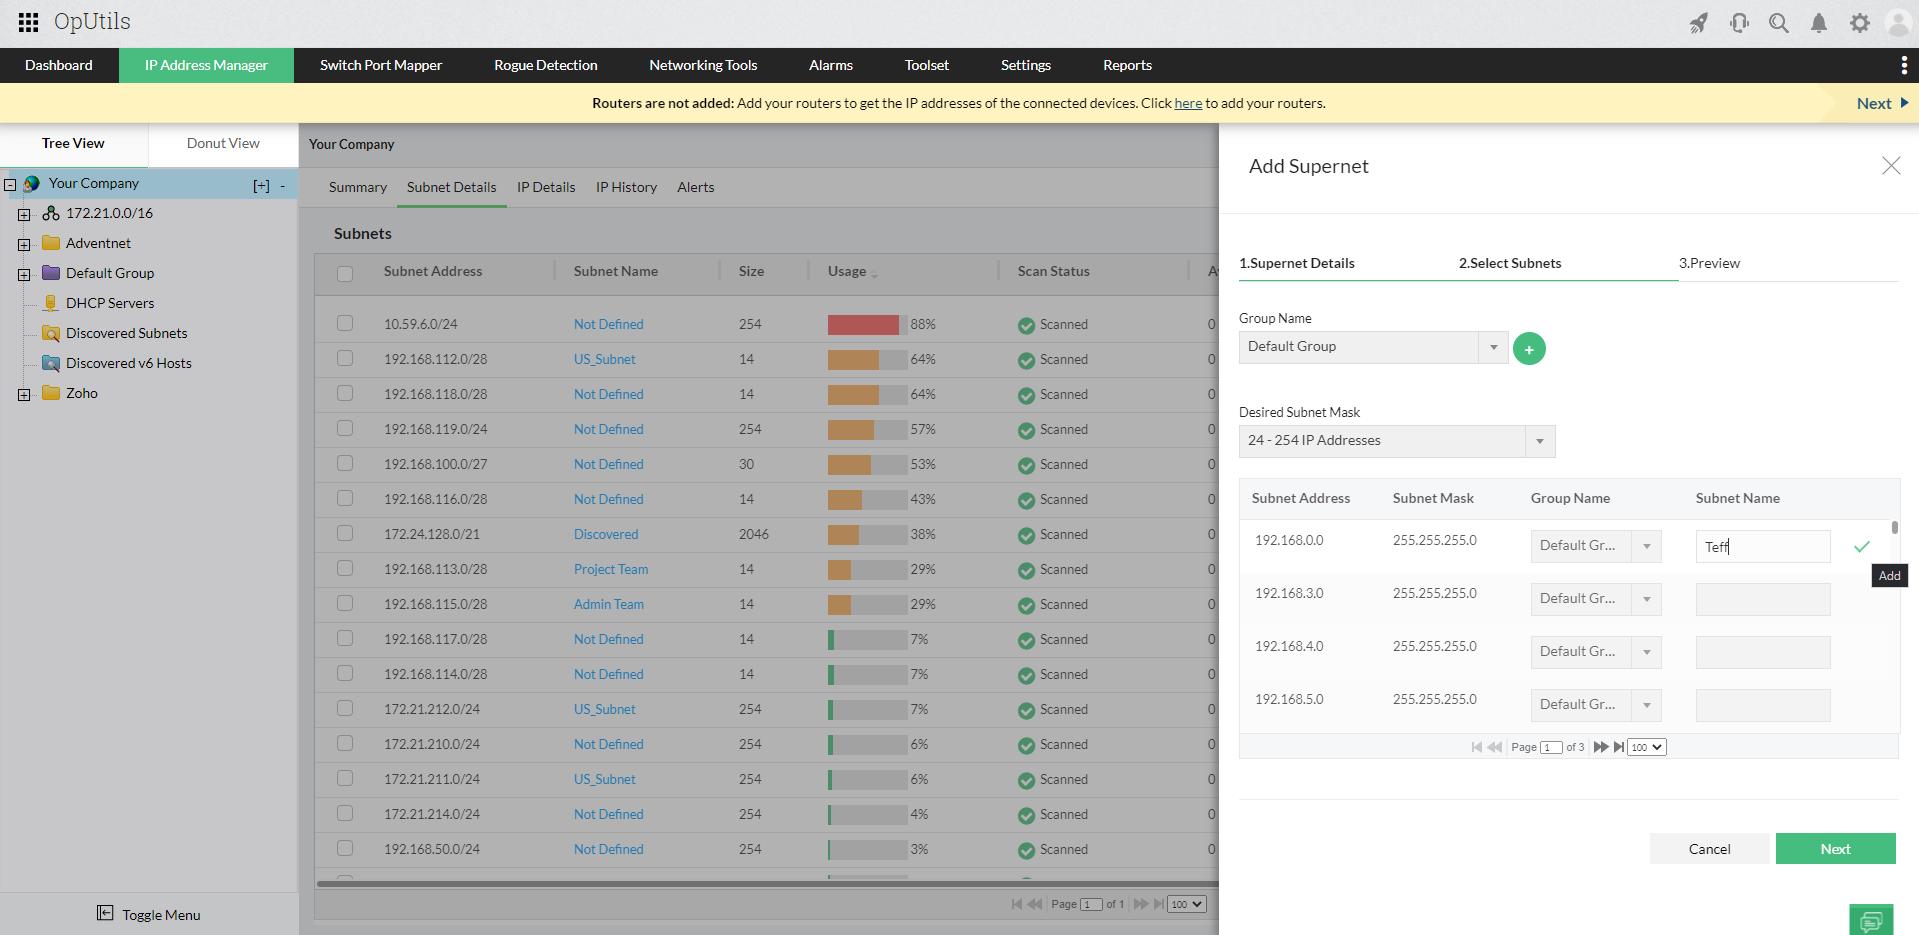 Supernet tools – ManageEngine OpUtils